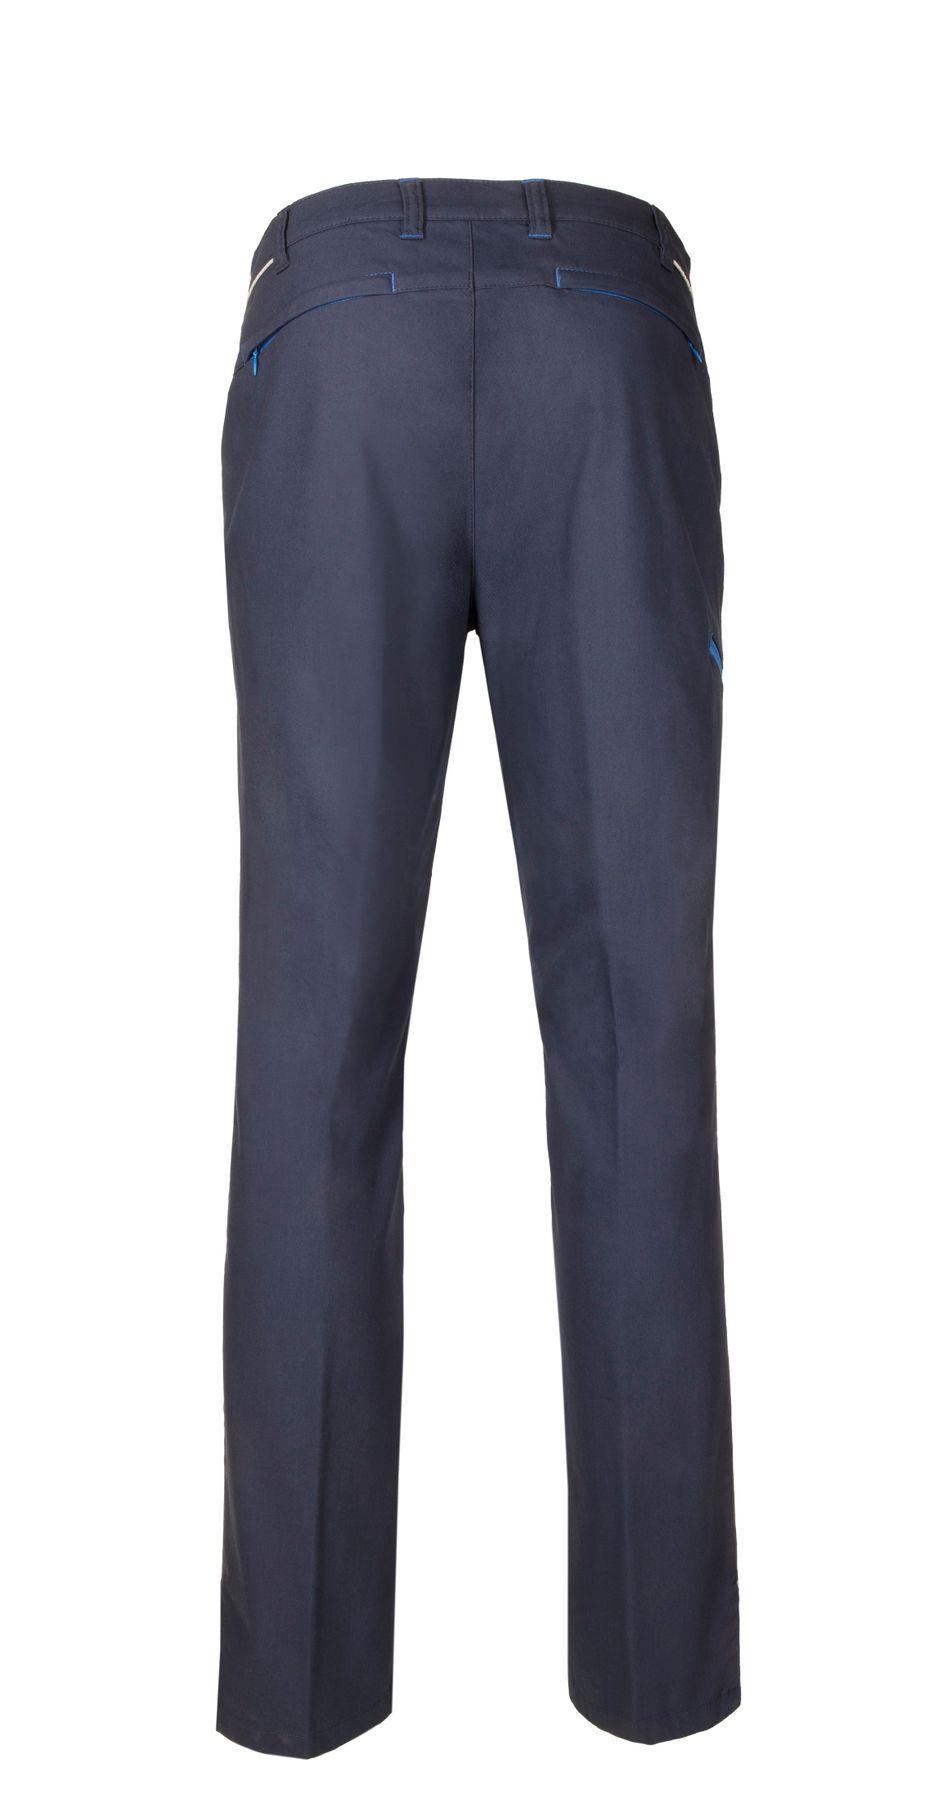 "Brühl - Herren 5-Pocket ,,Active Pants"" Hose in blau, Ravenna (0589183070100) – Bild 2"